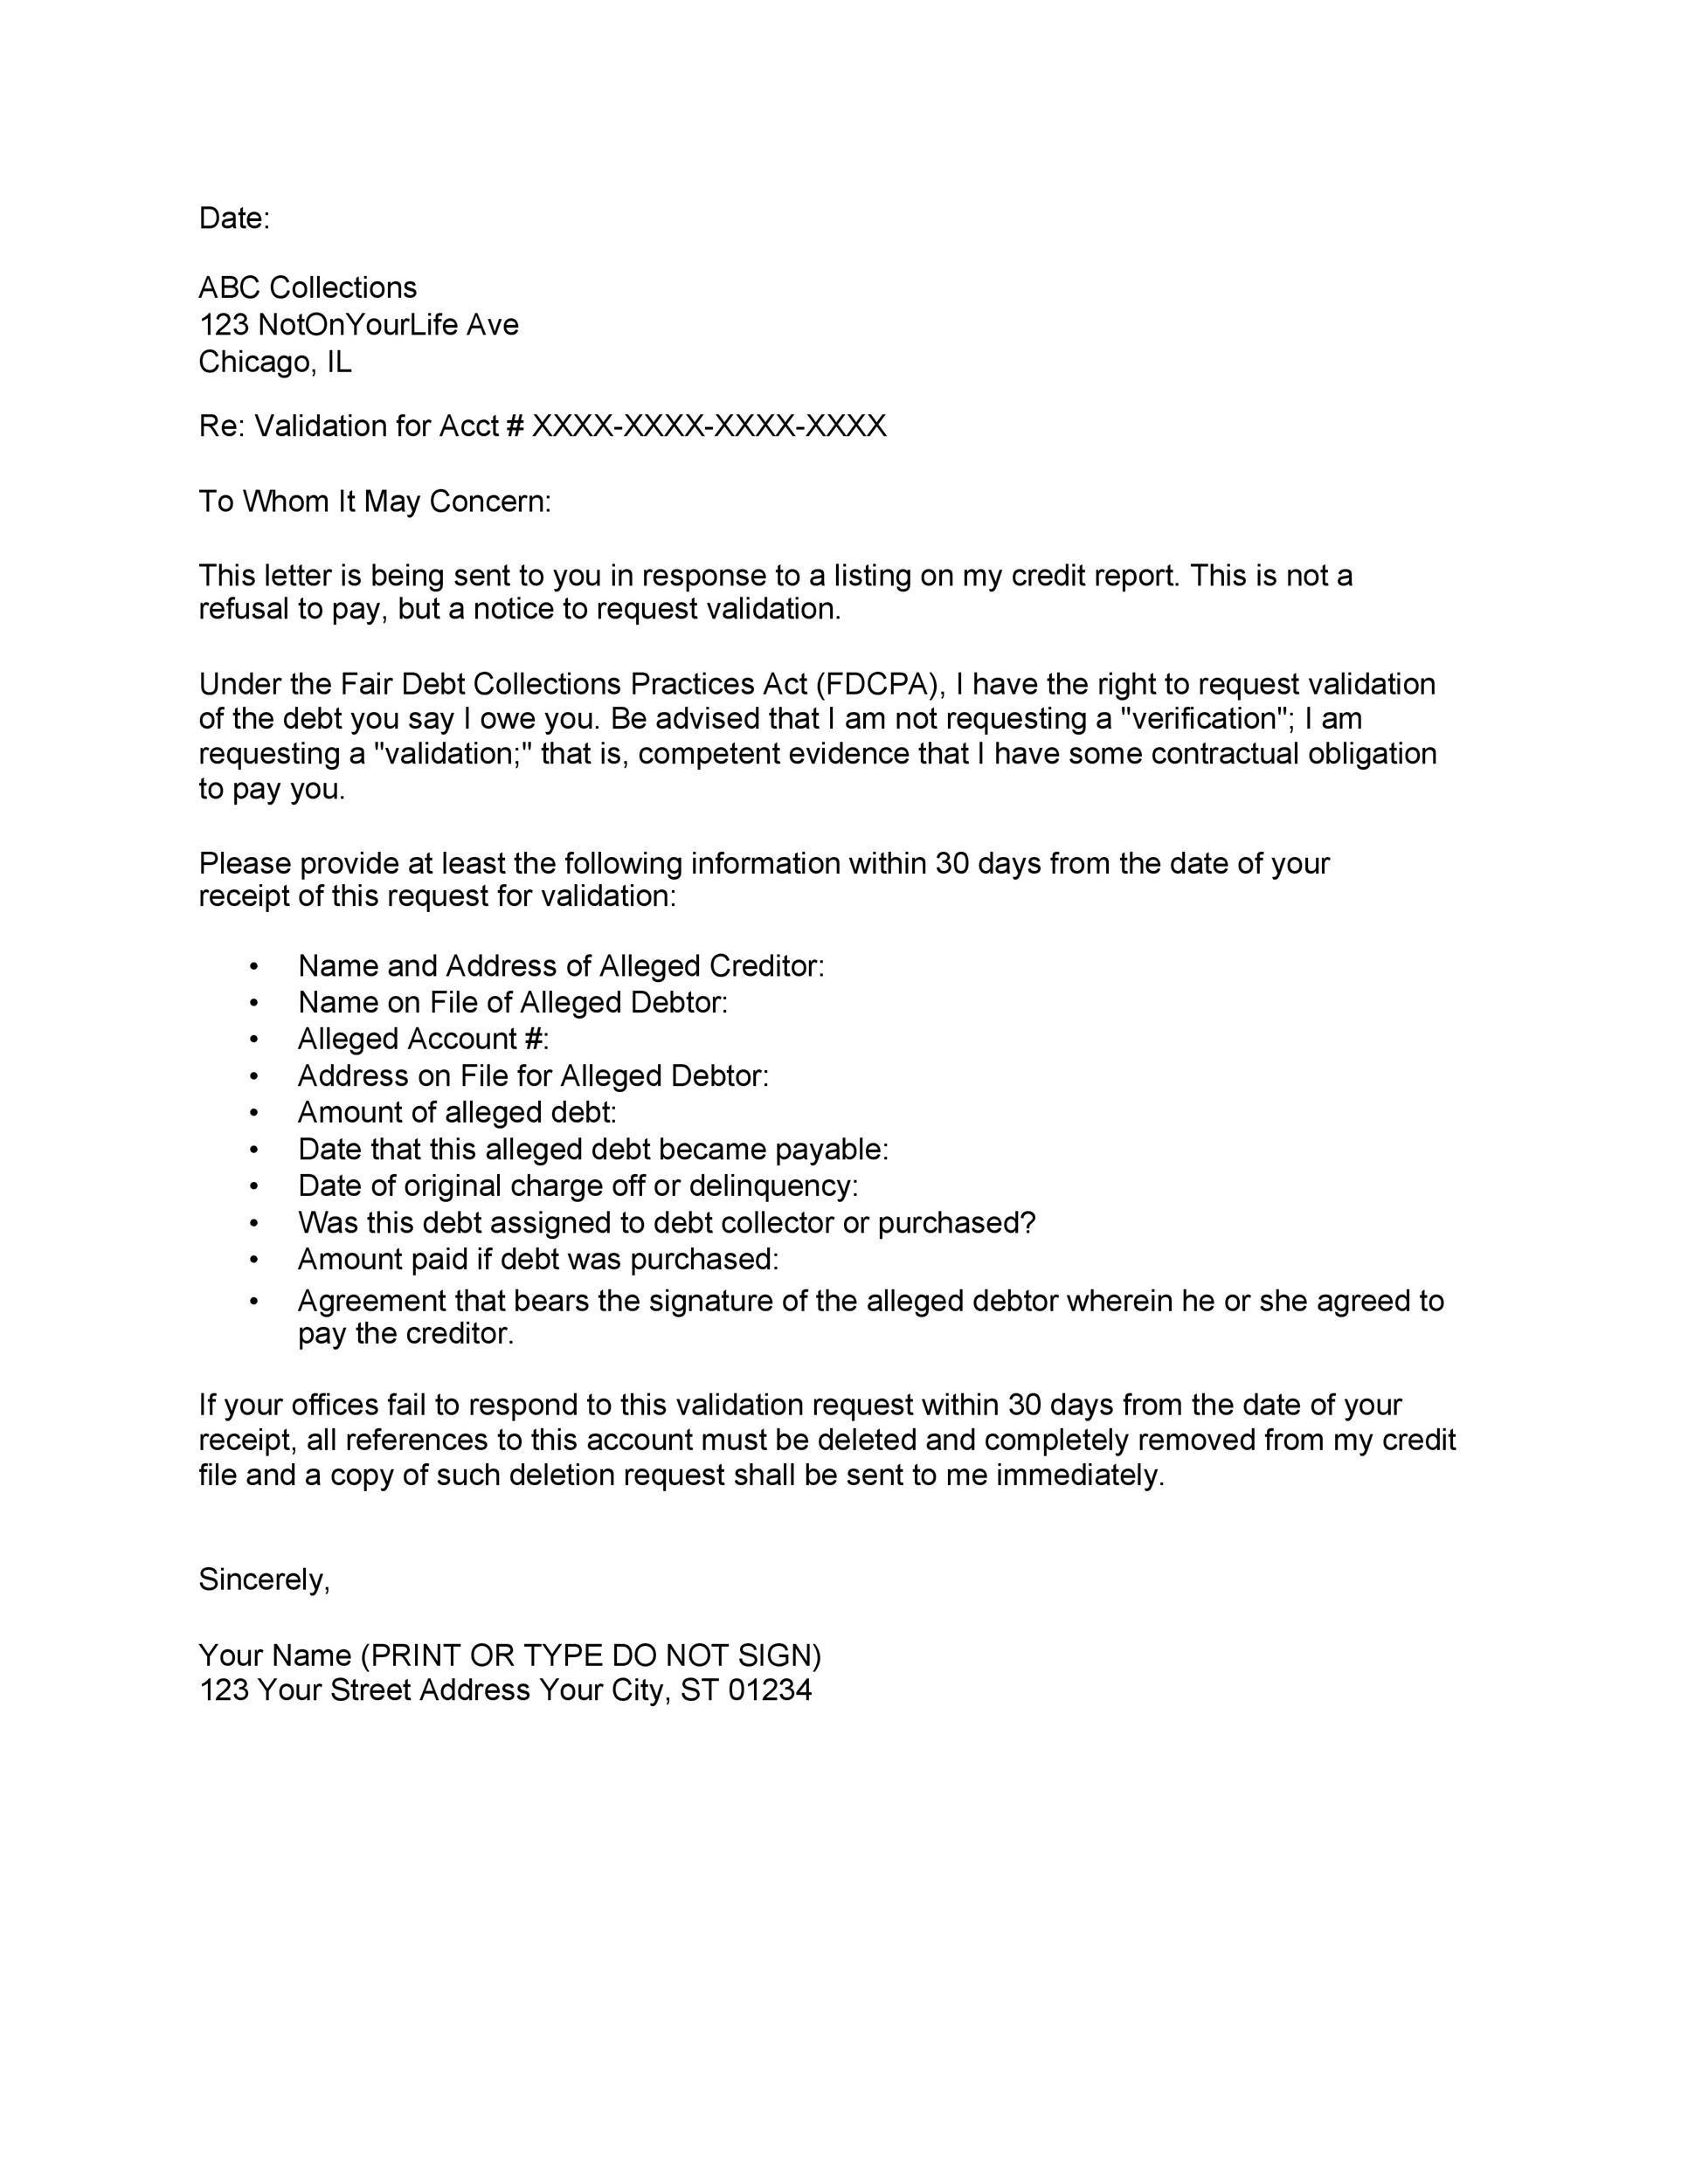 Free debt validation letter 02